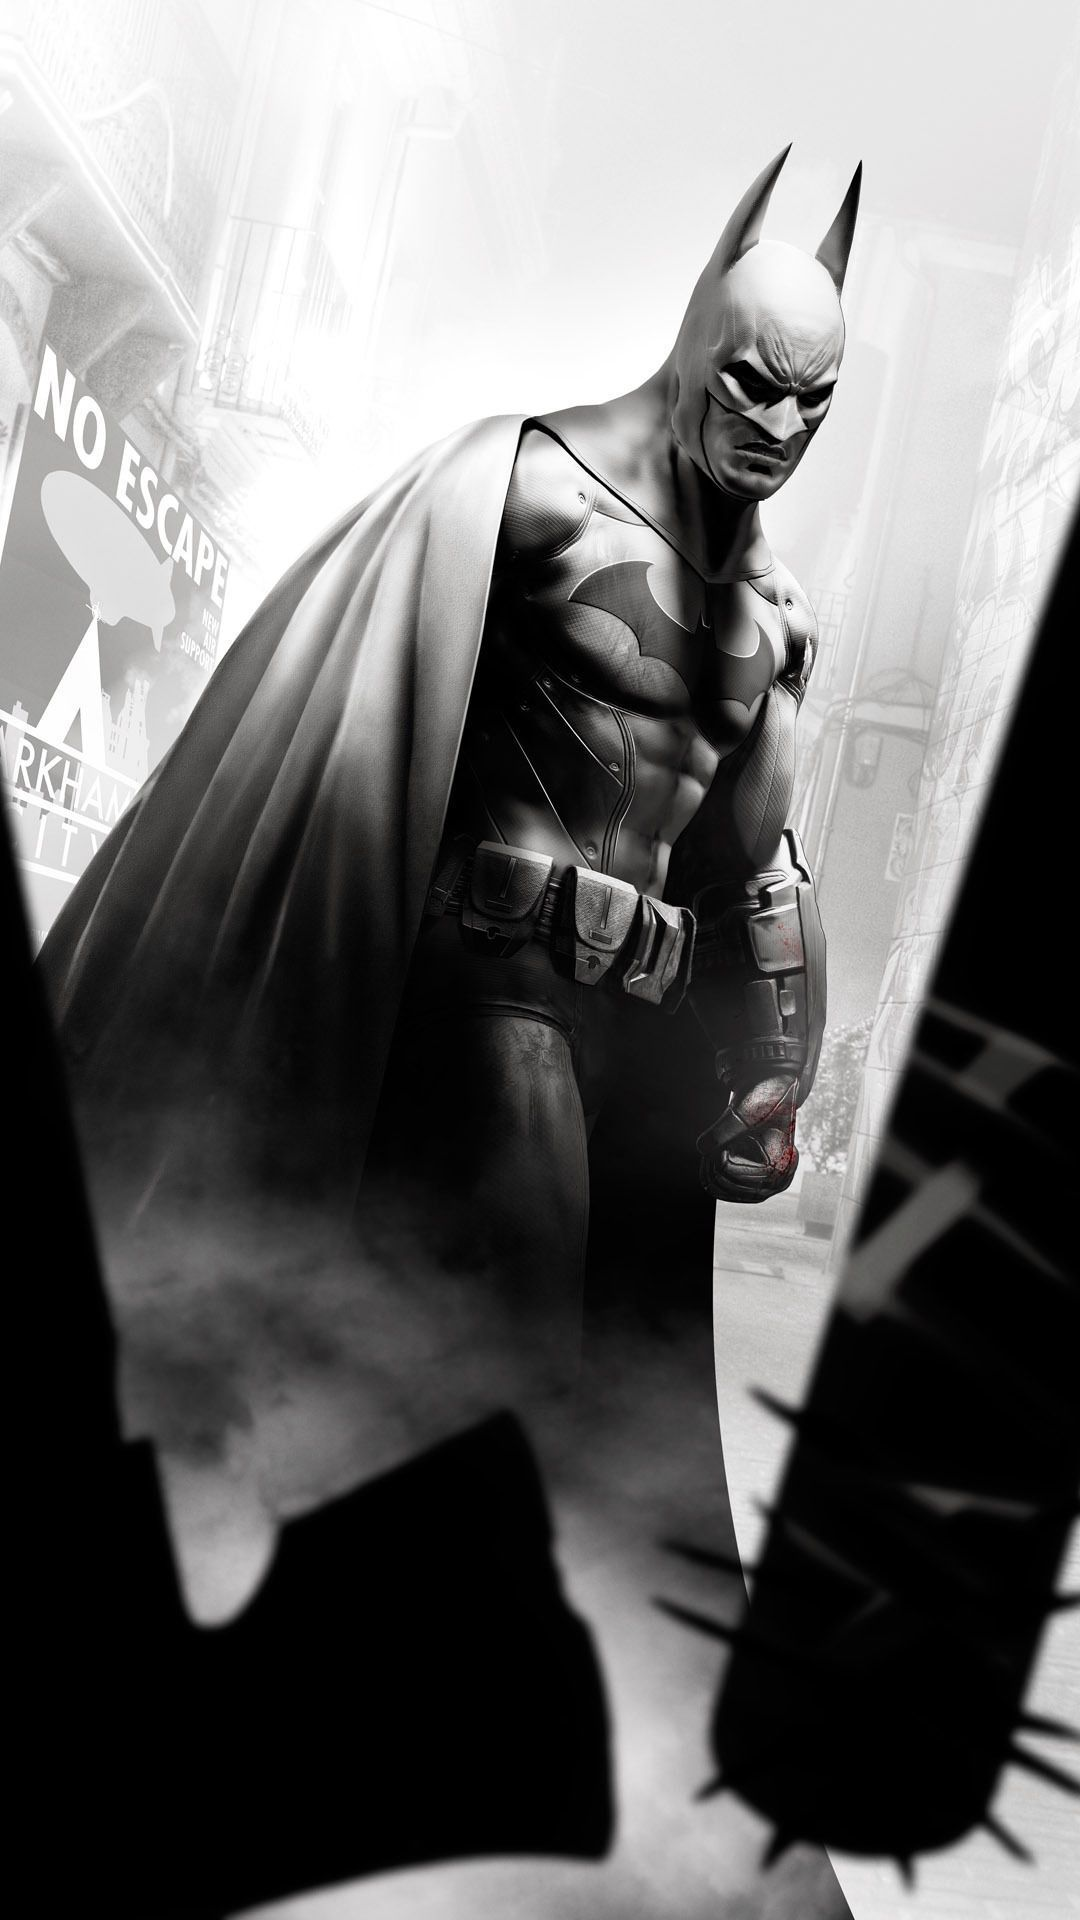 Game Mobile Wallpapers - Batman Arkham City Iphone , HD Wallpaper & Backgrounds